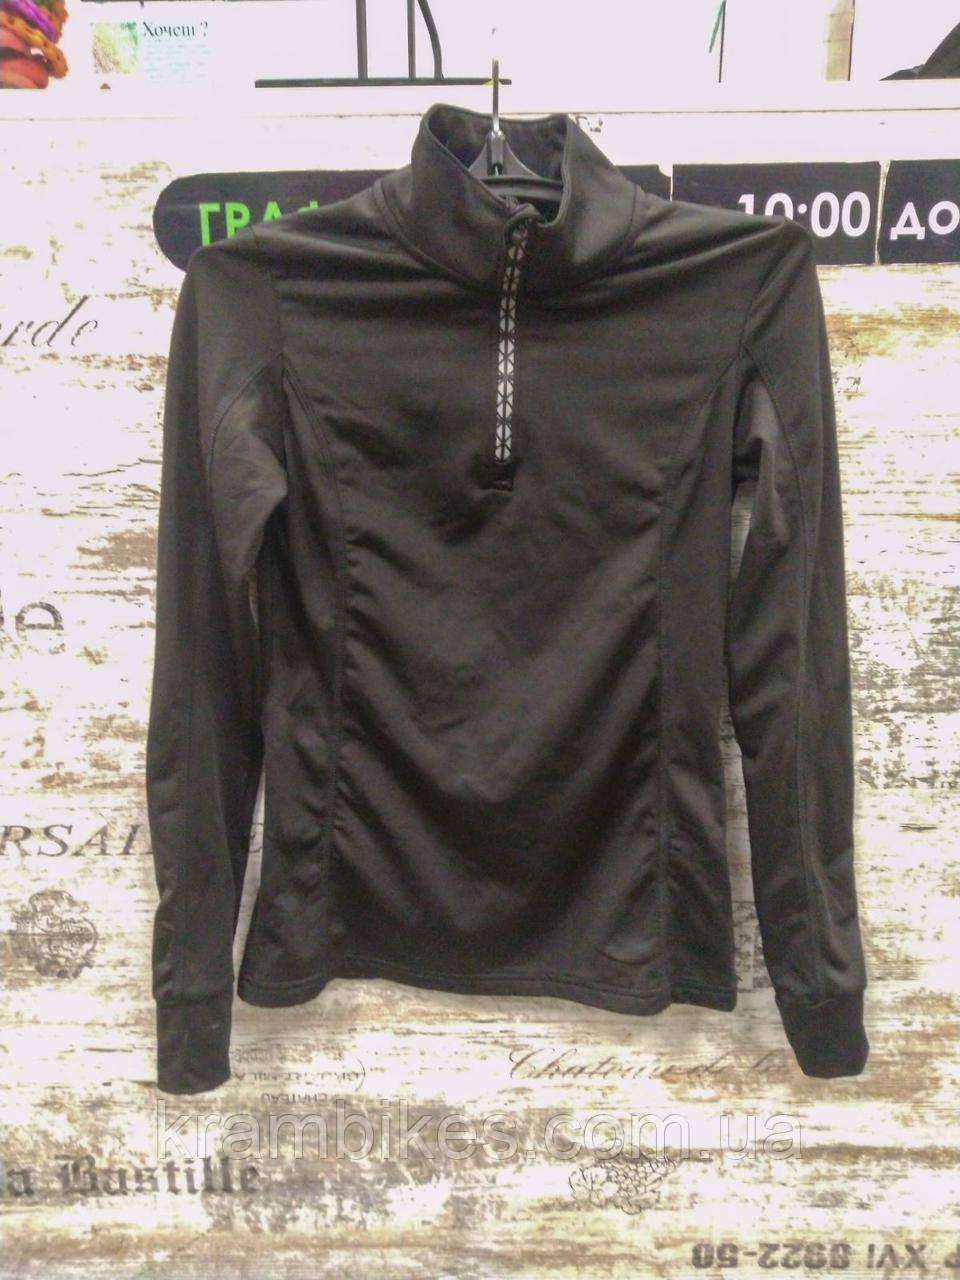 Велокофта Crivit Sports - размер S,M,L, Чёрный/Серый